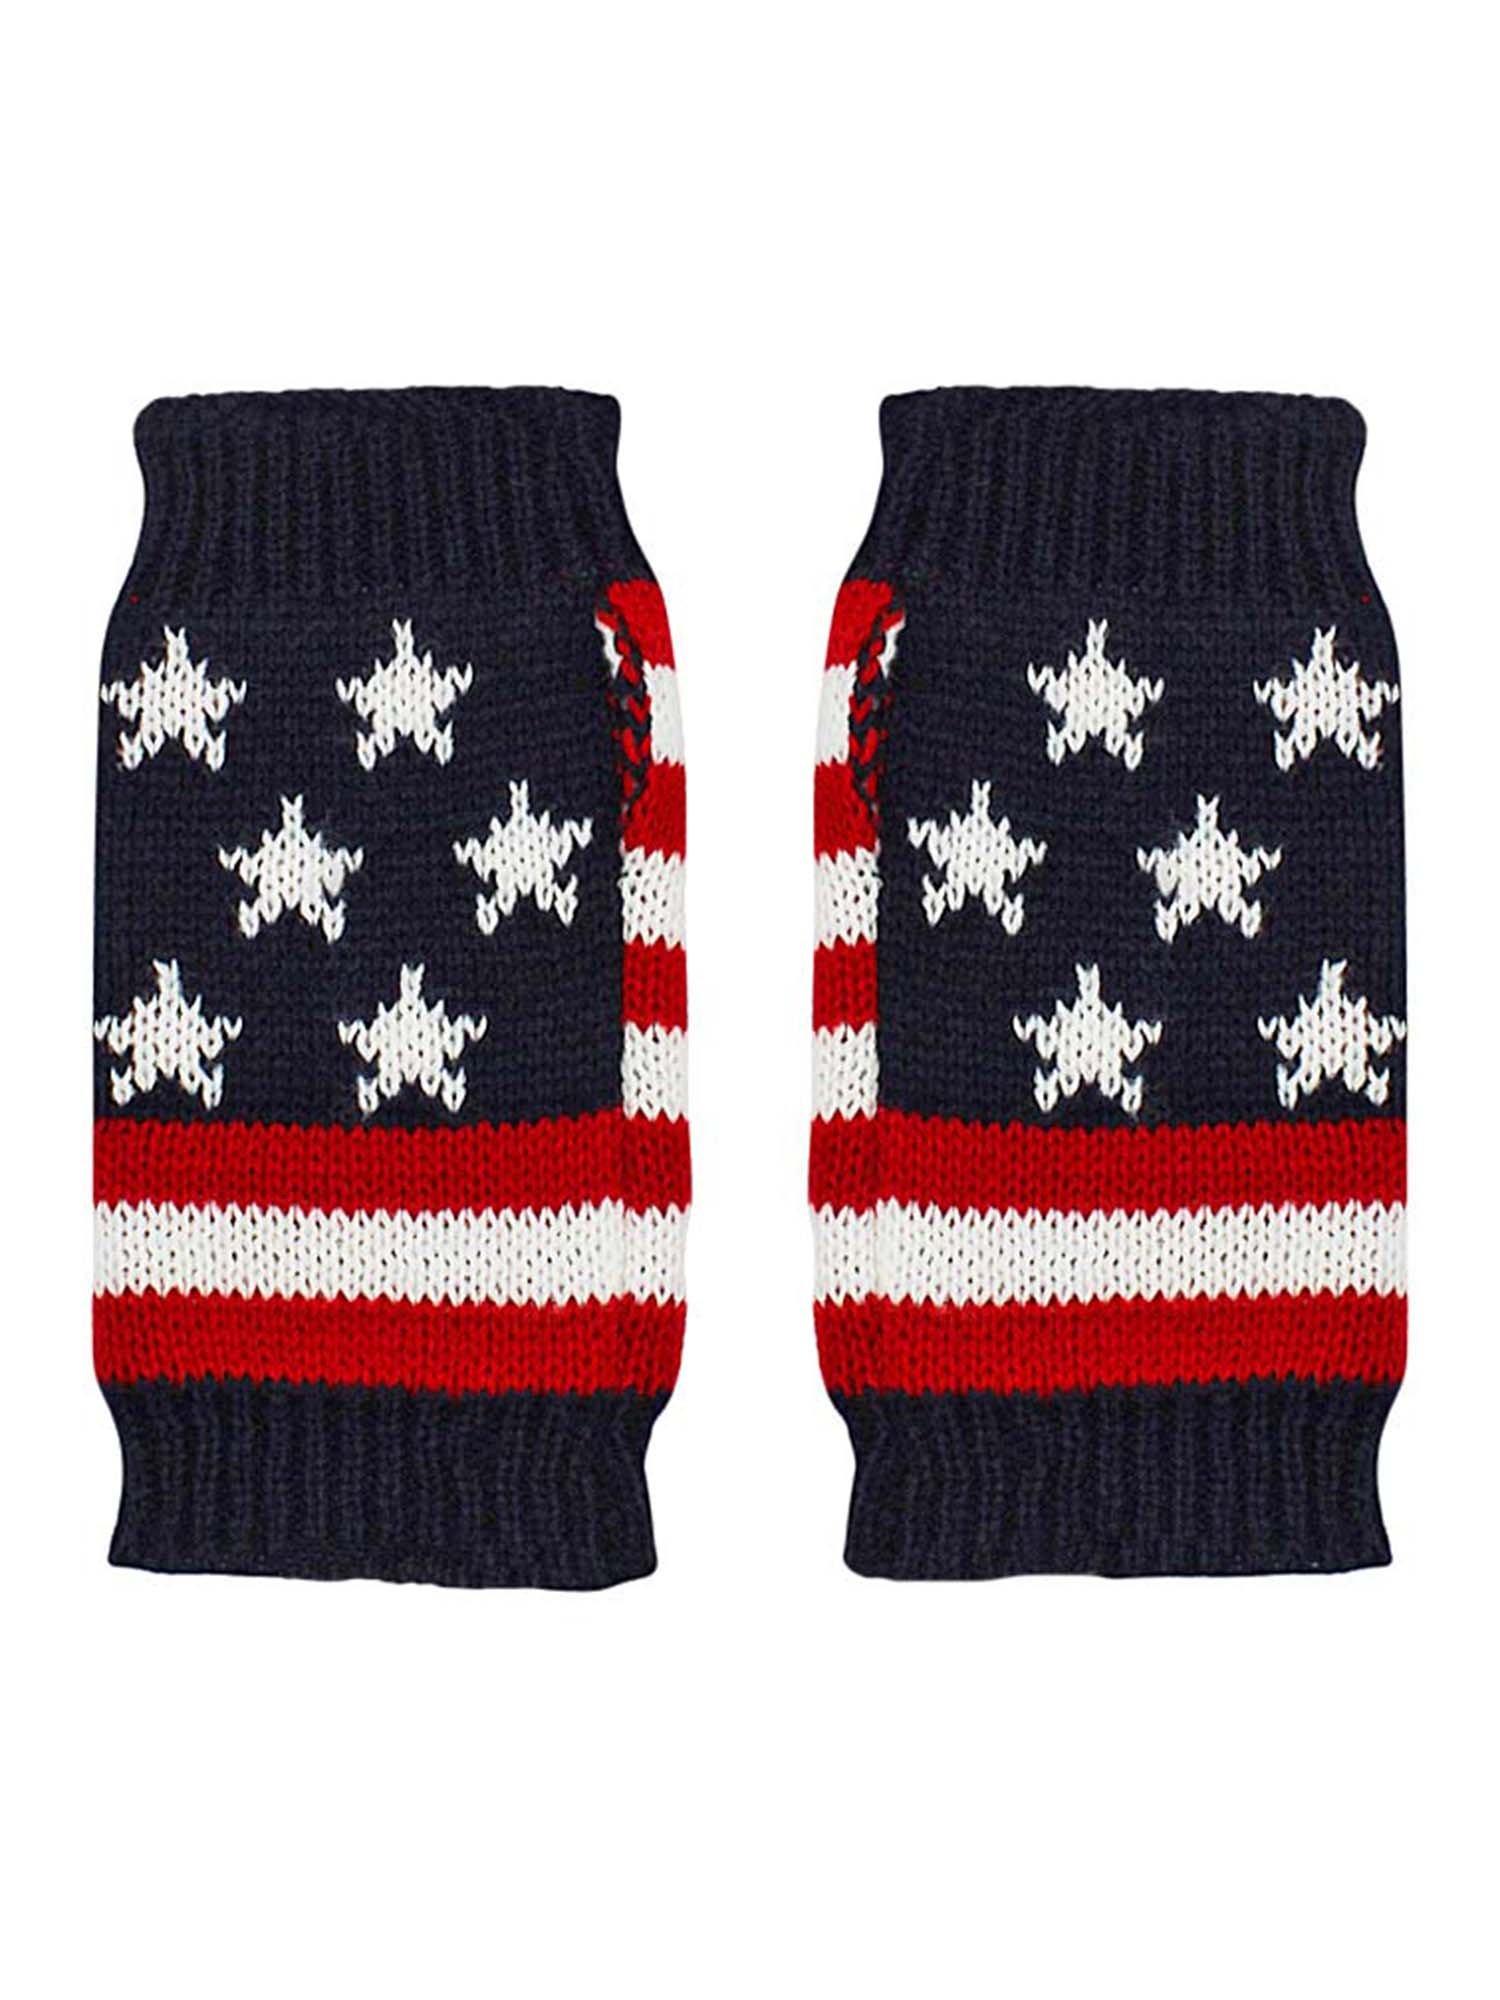 American Flag Knit Fingerless Glove Arm Warmers